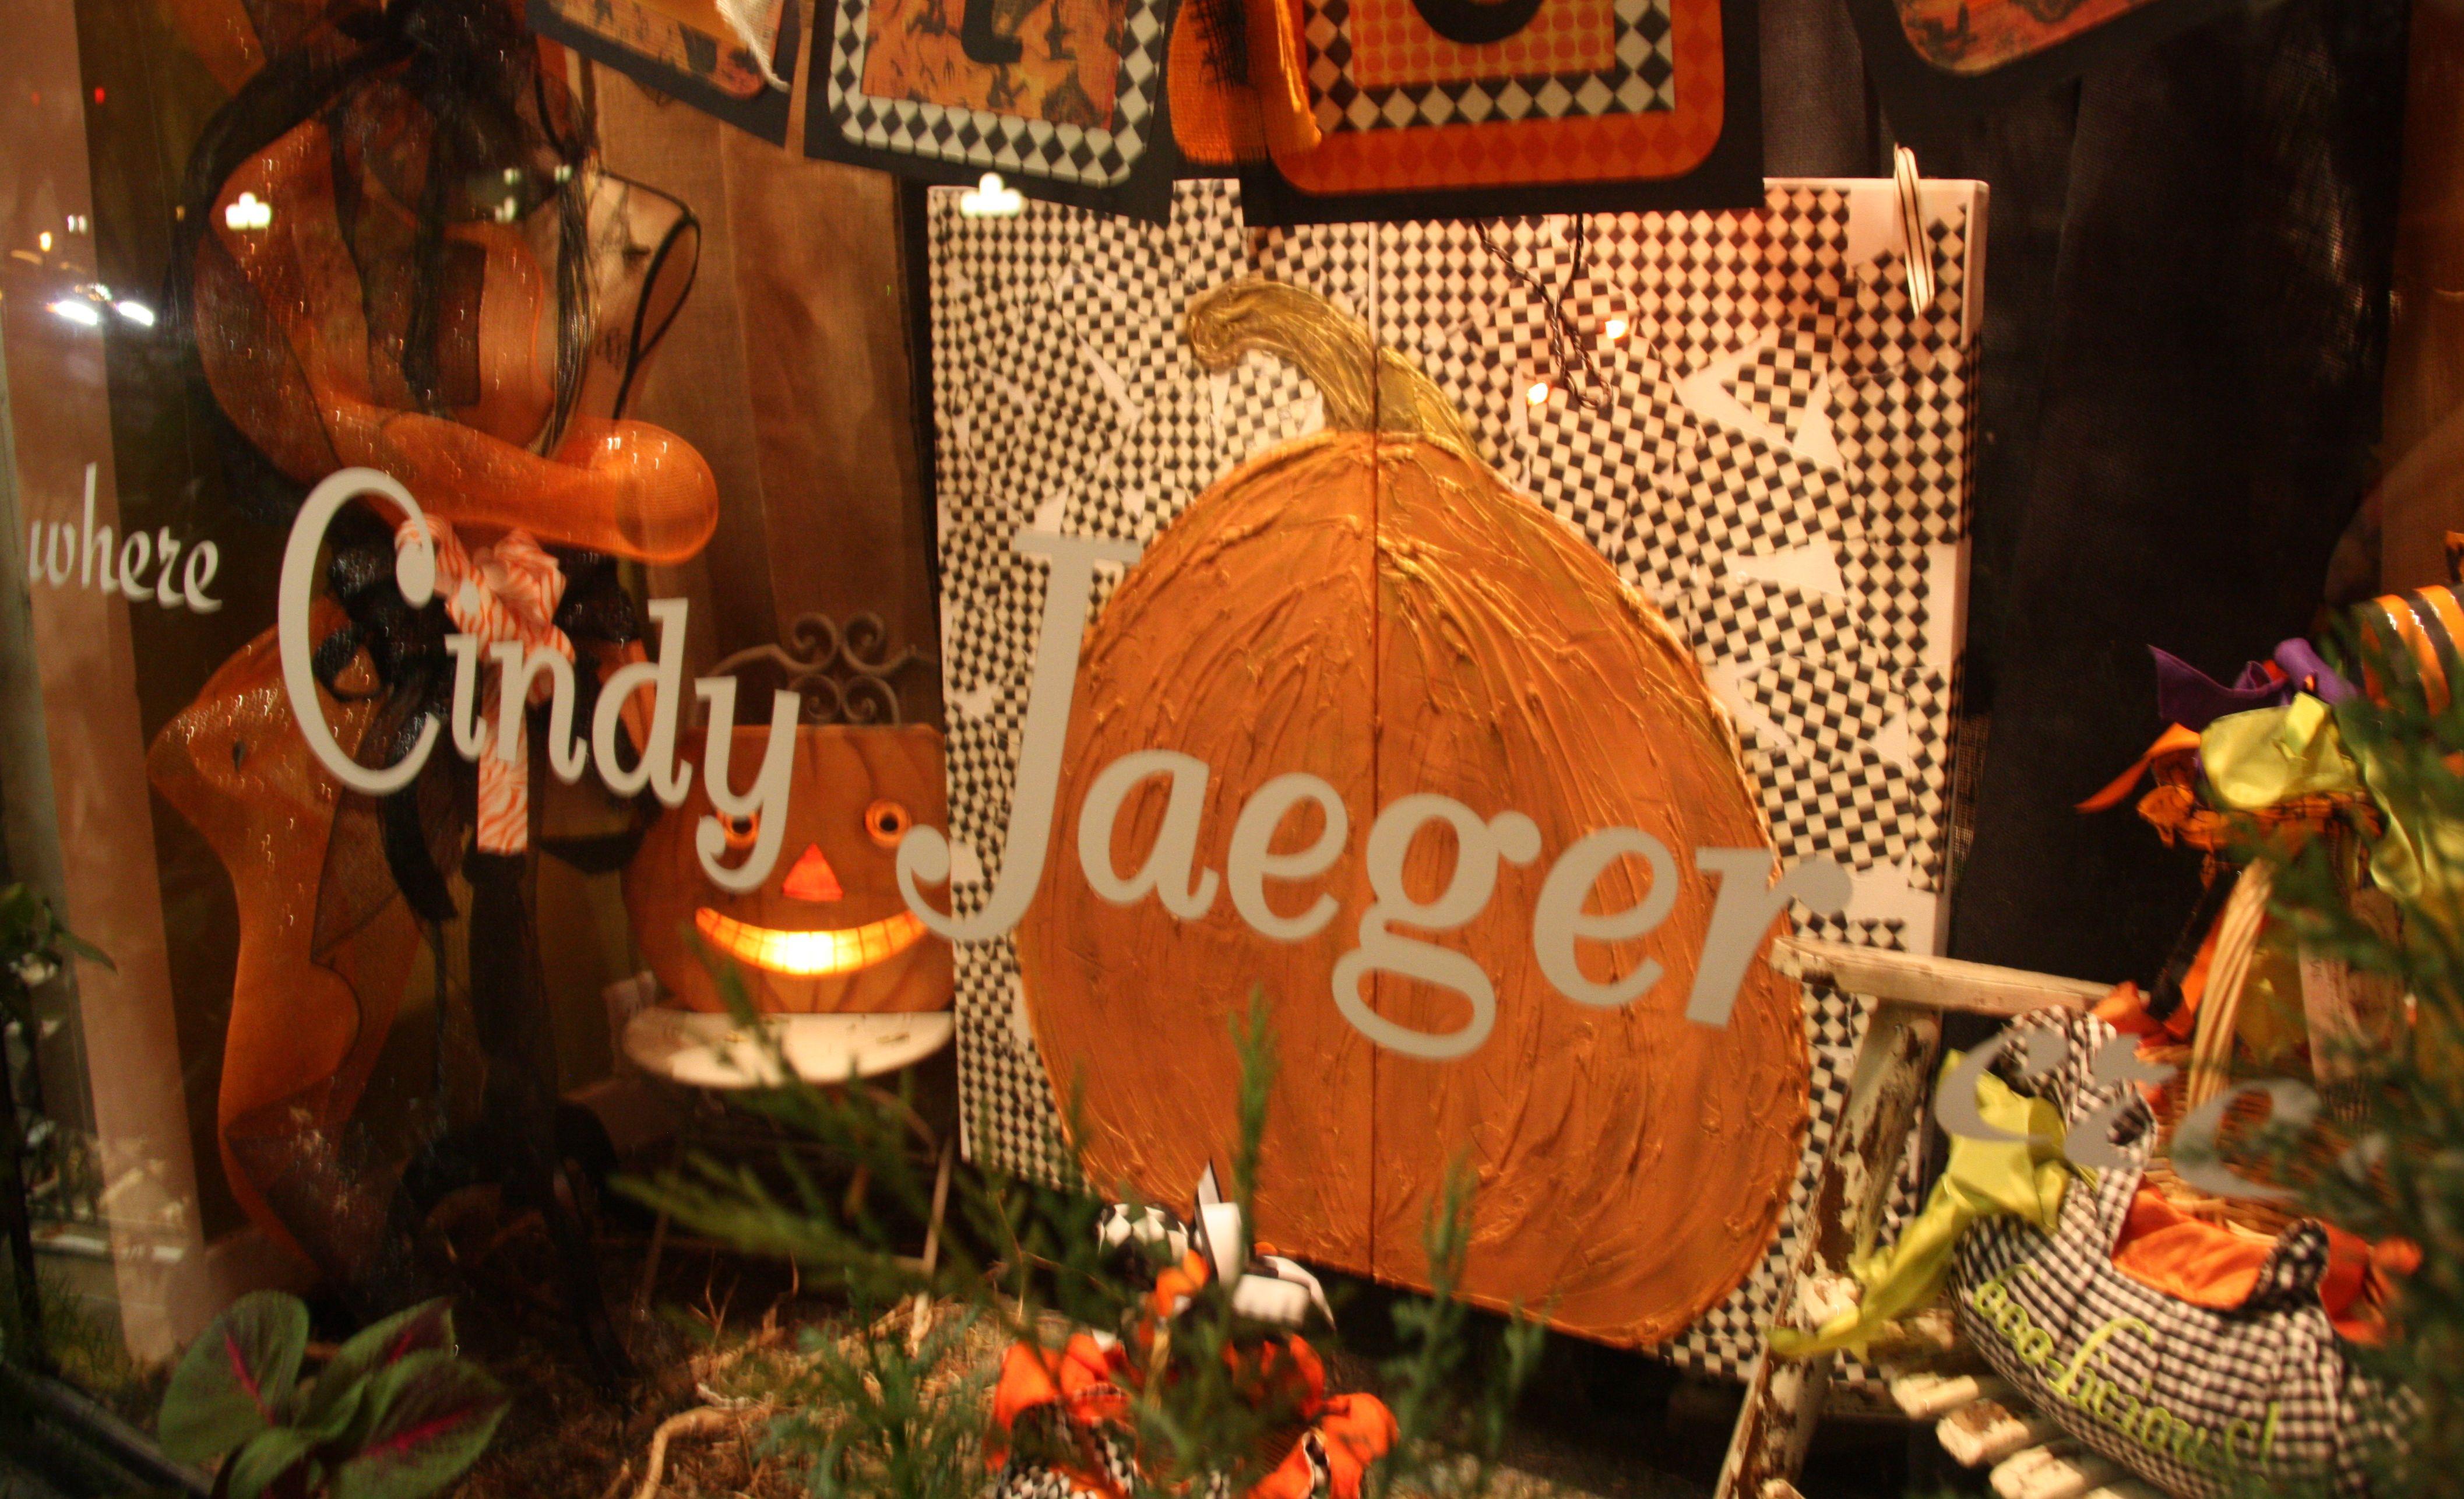 Cindy Jaeger Designs in Tomball, Texas Pumpkin canvas